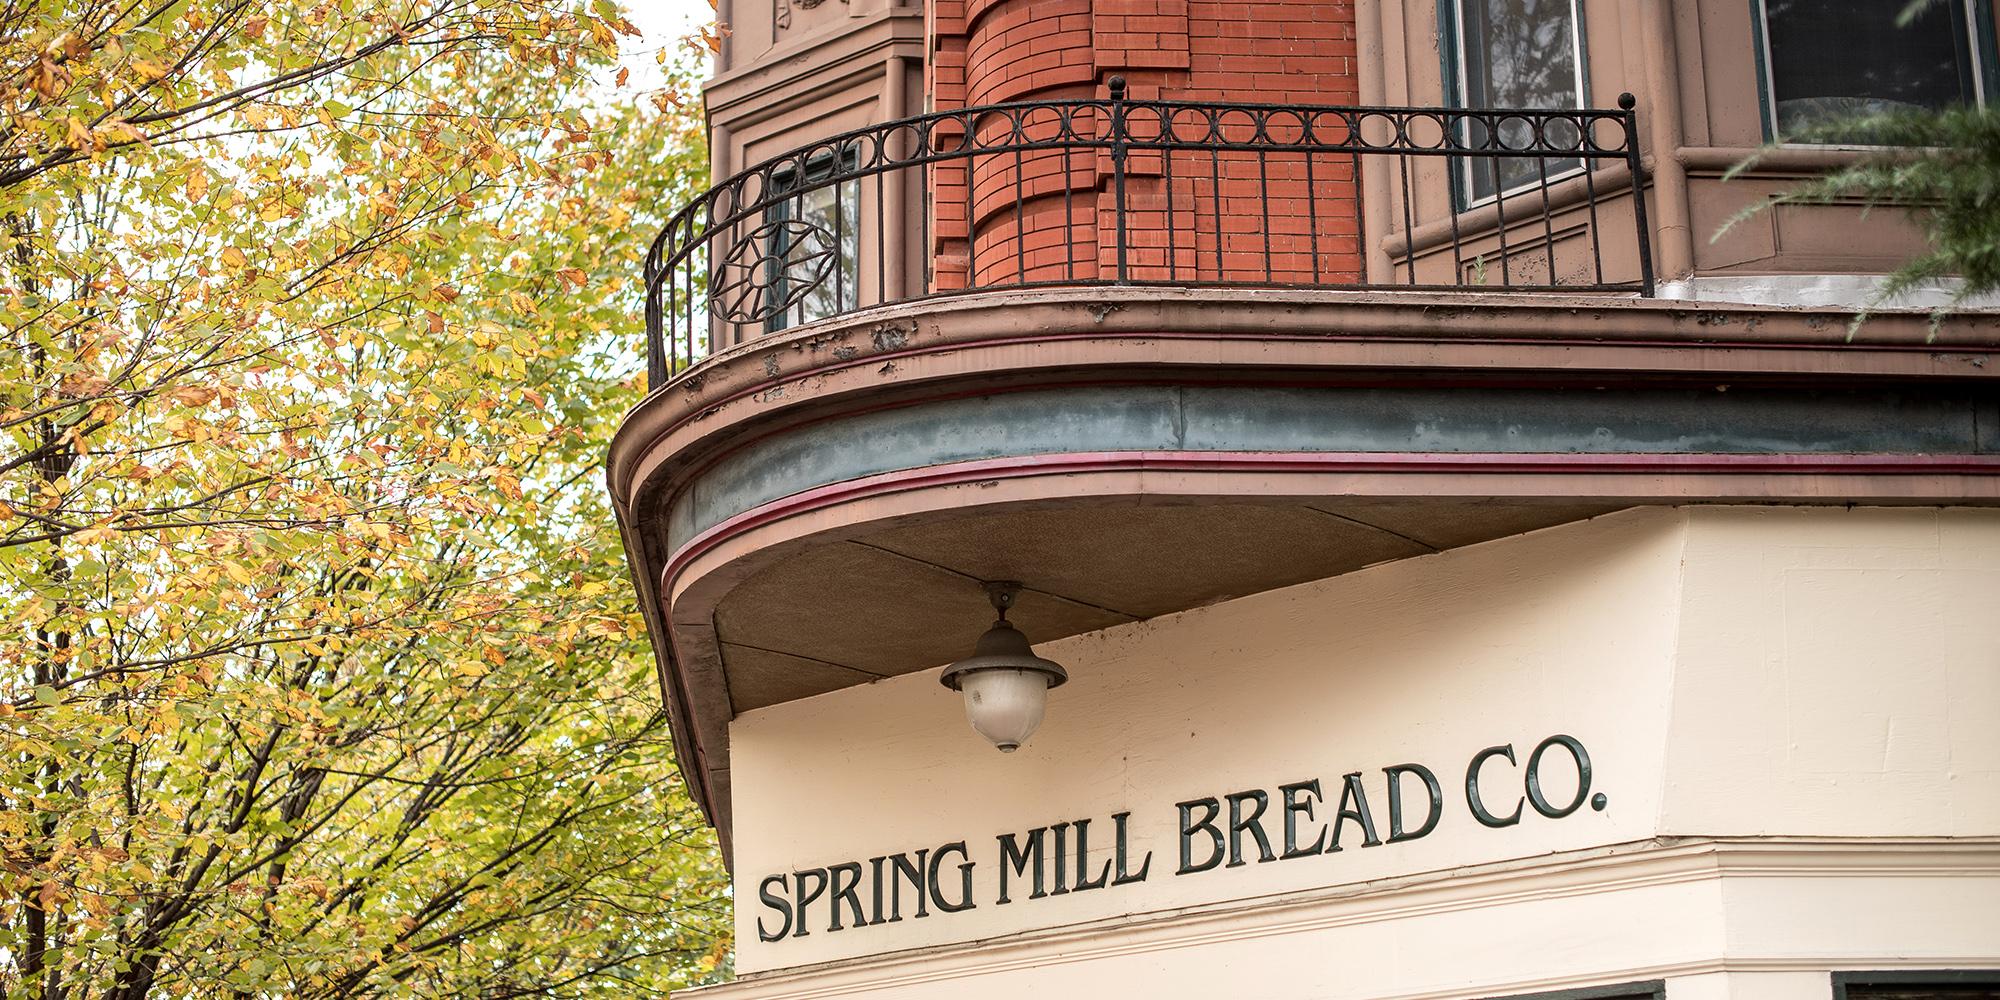 ARTISANAL BAKED GOODS AT SPRING MILL BREAD COMPANY